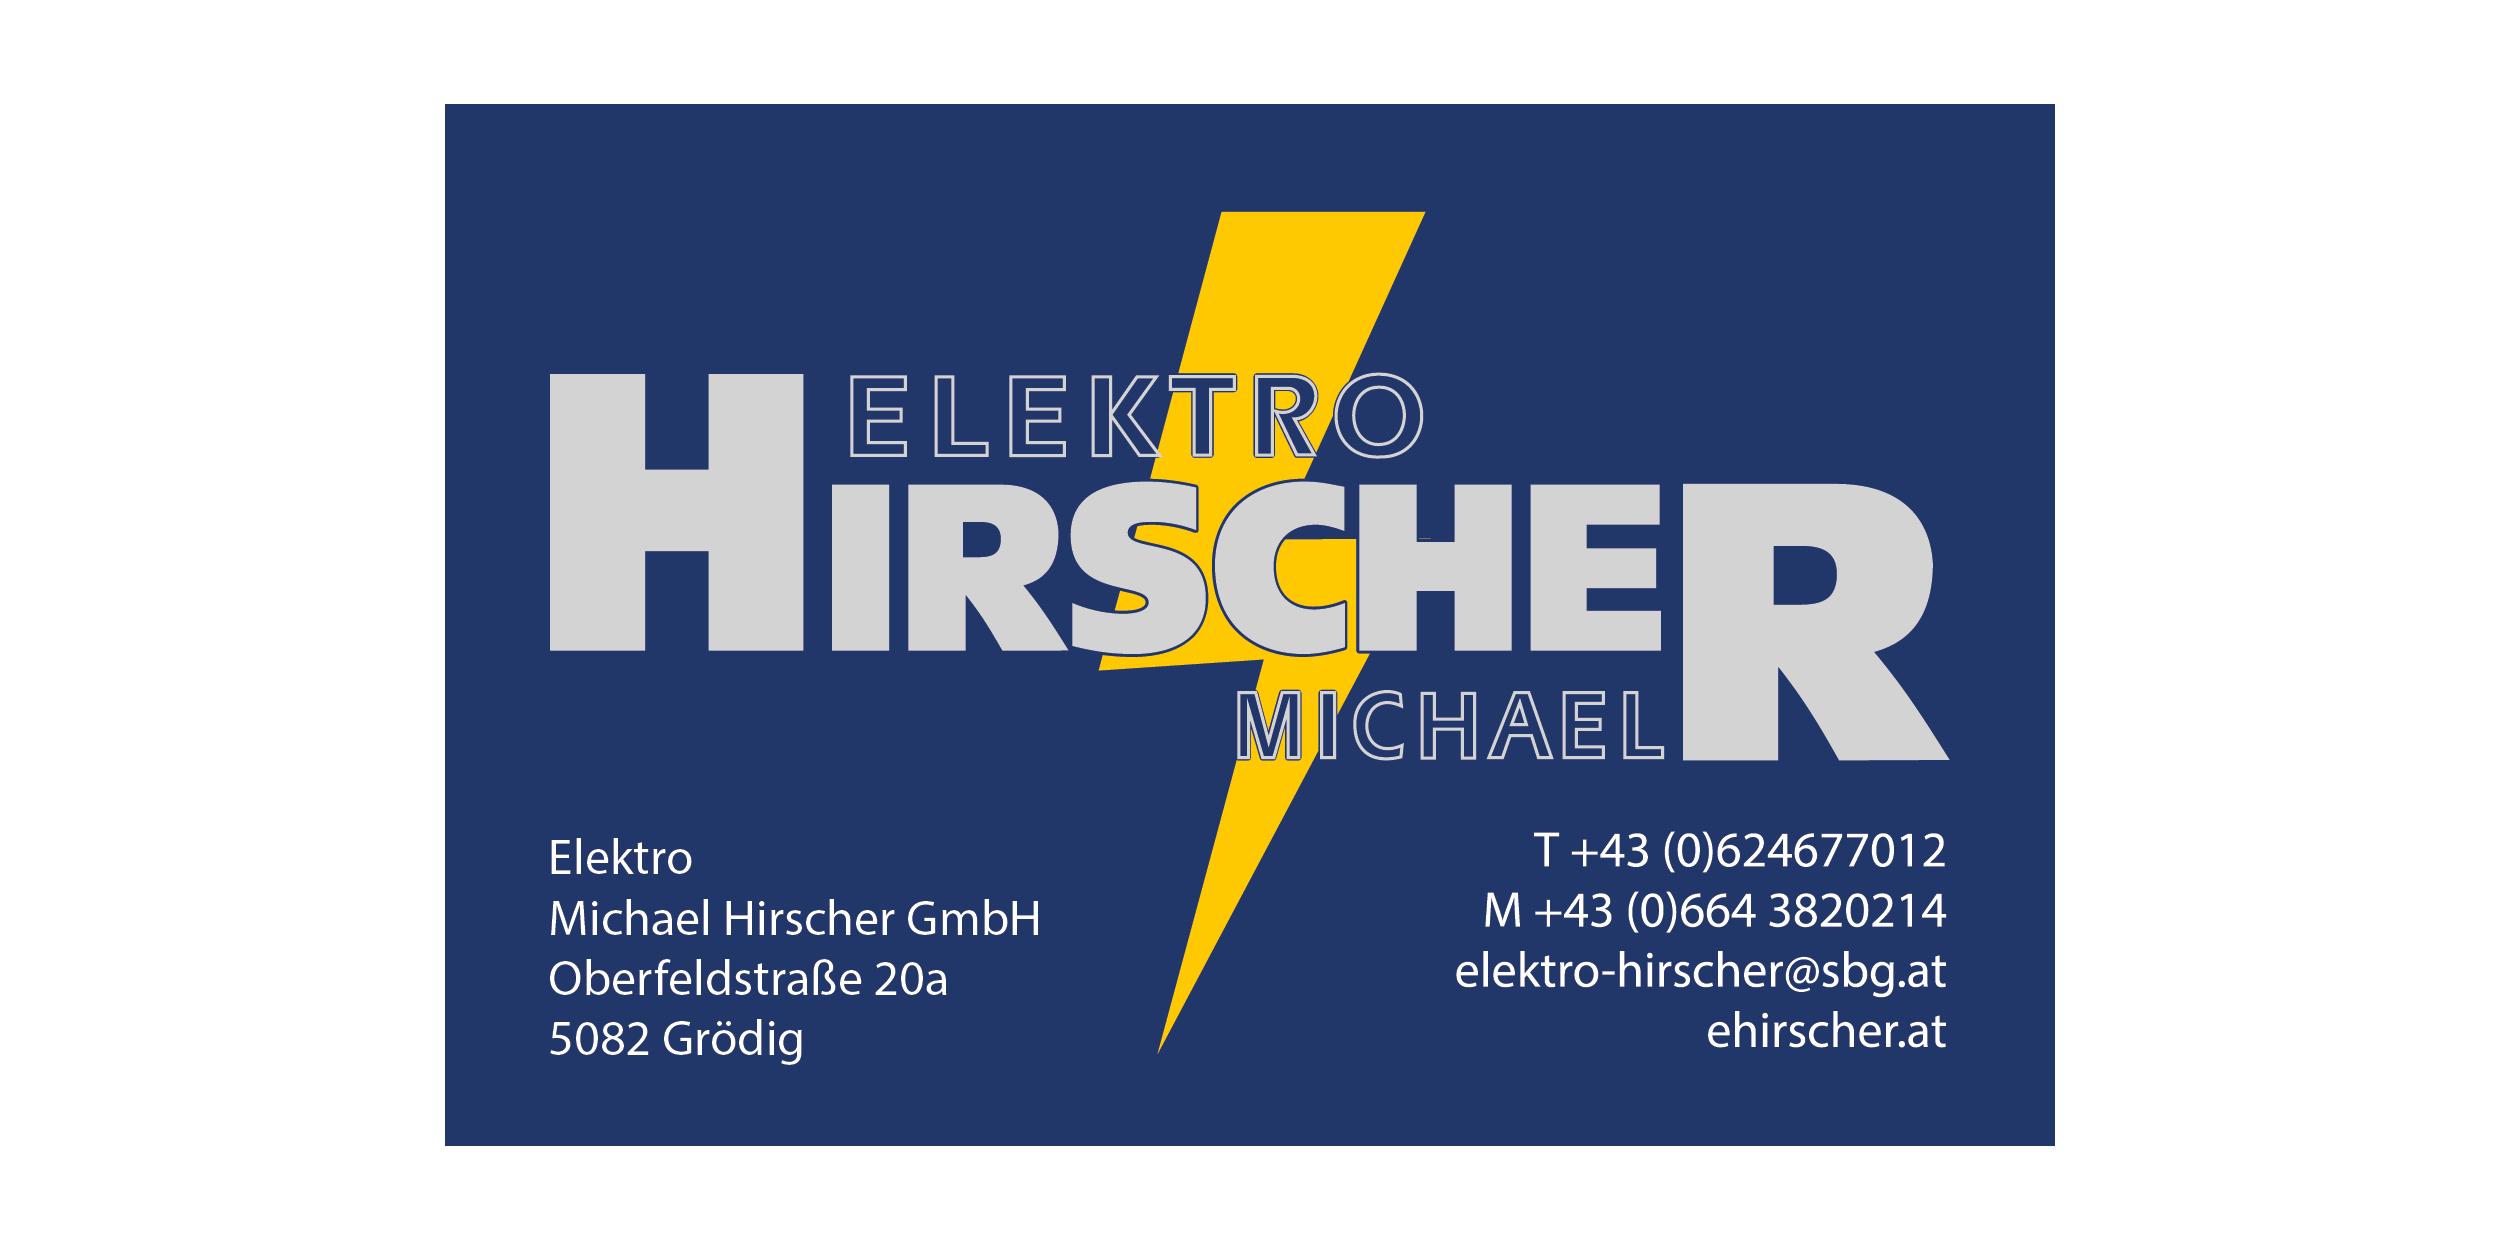 SVG Sponsor - Elektro Hirscher